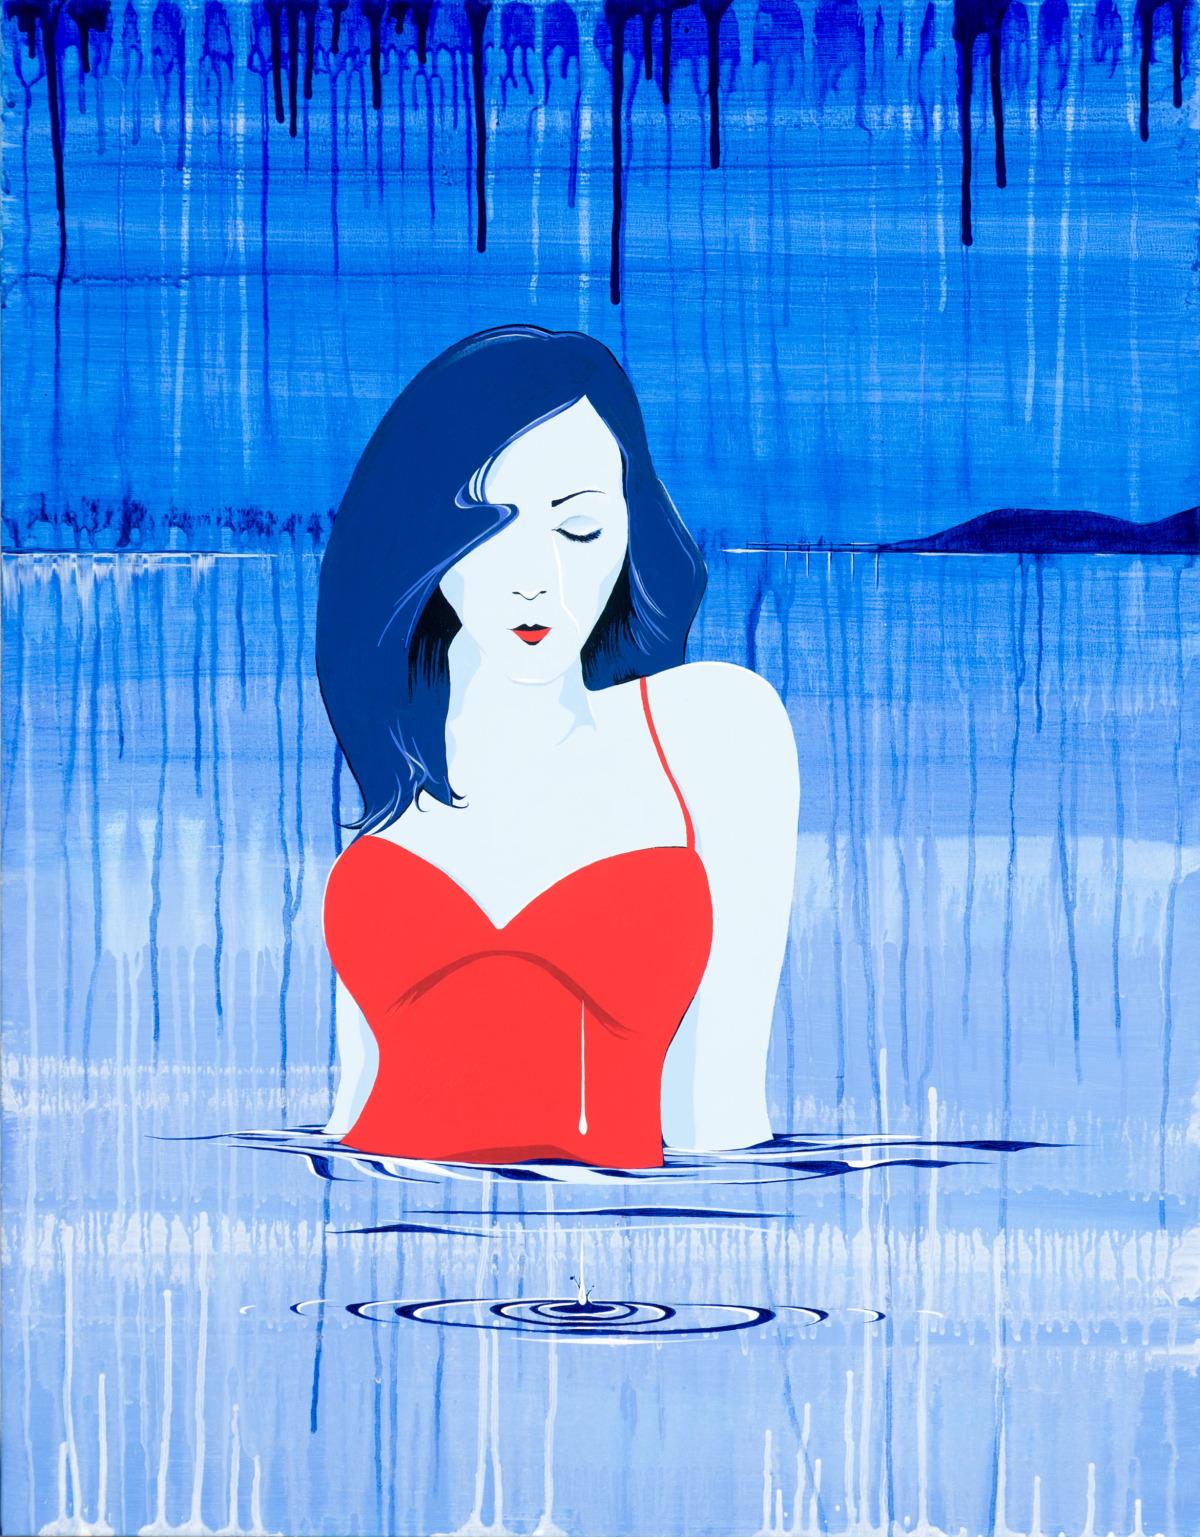 'Drowning in Tears'